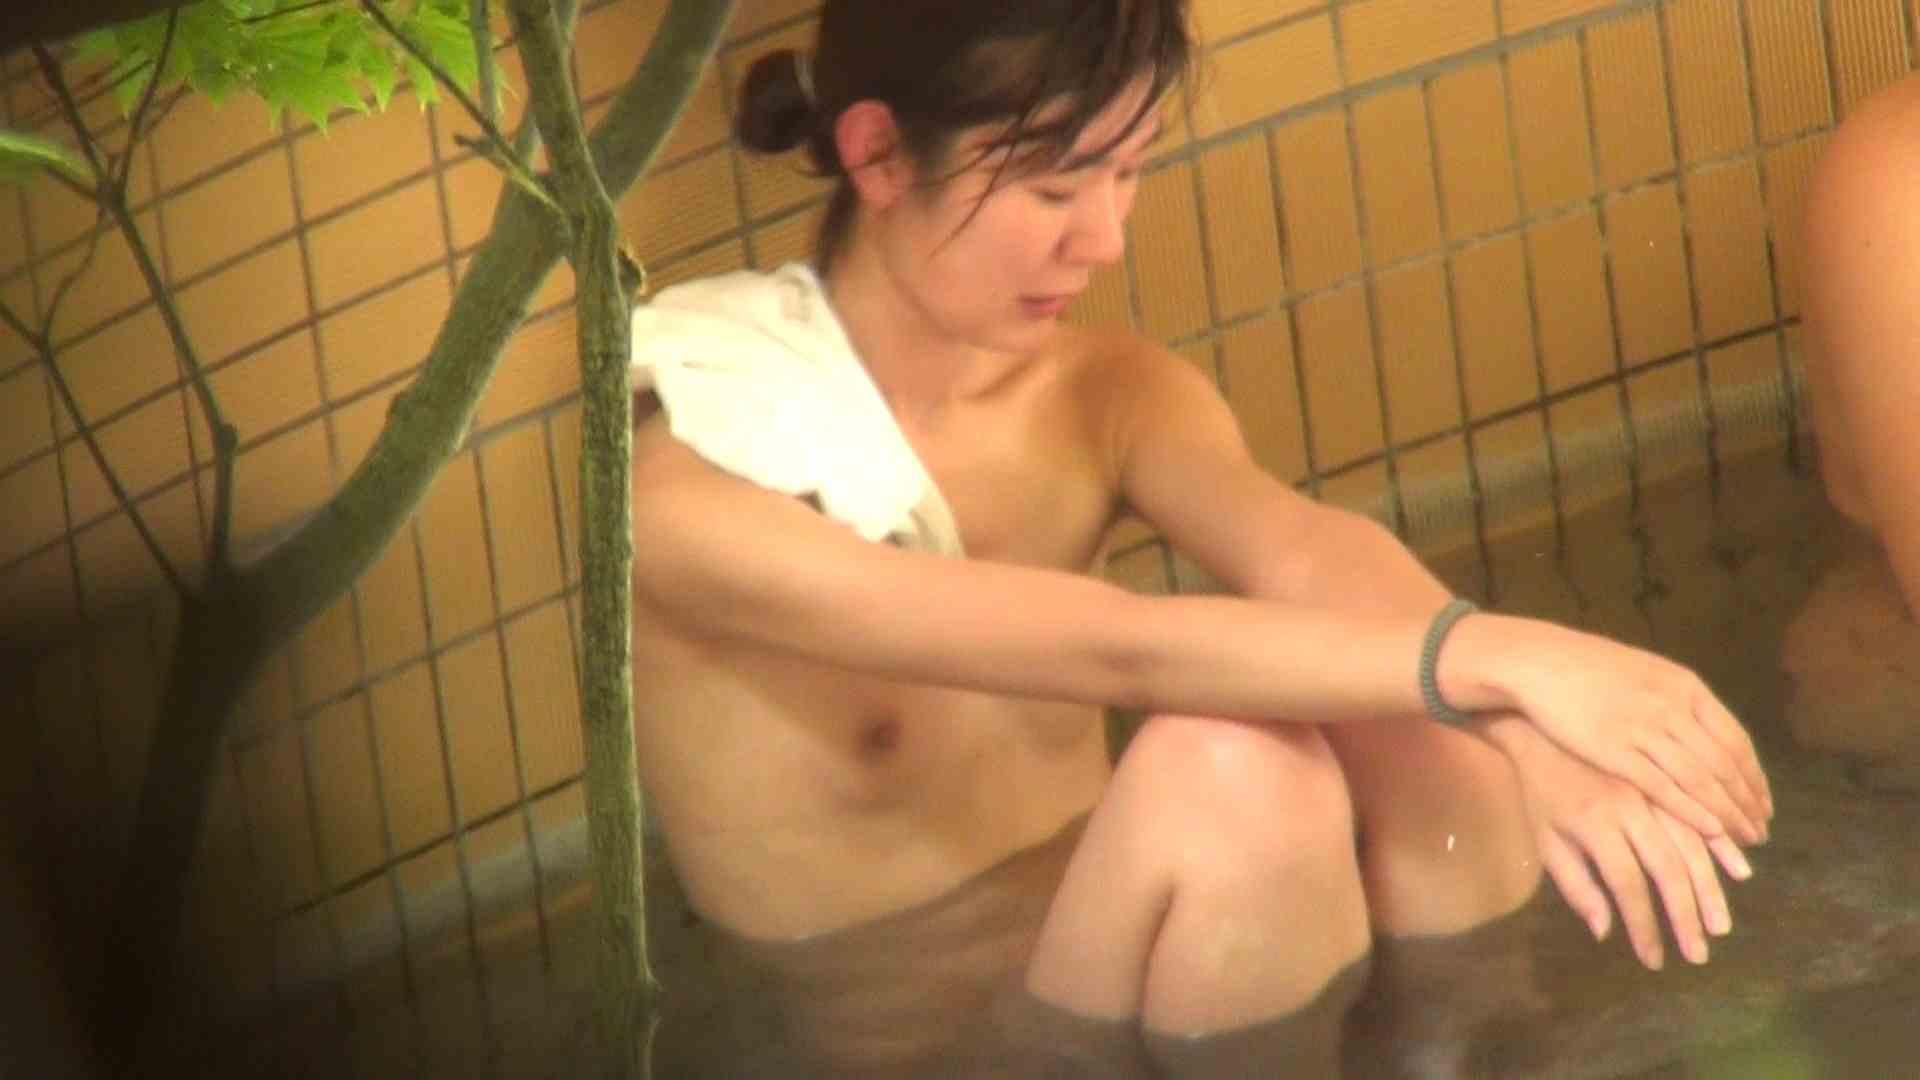 Vol.77 お上品な貧乳色白お女市さまの裸を見る醍醐味 露天入浴 AV無料 107枚 83